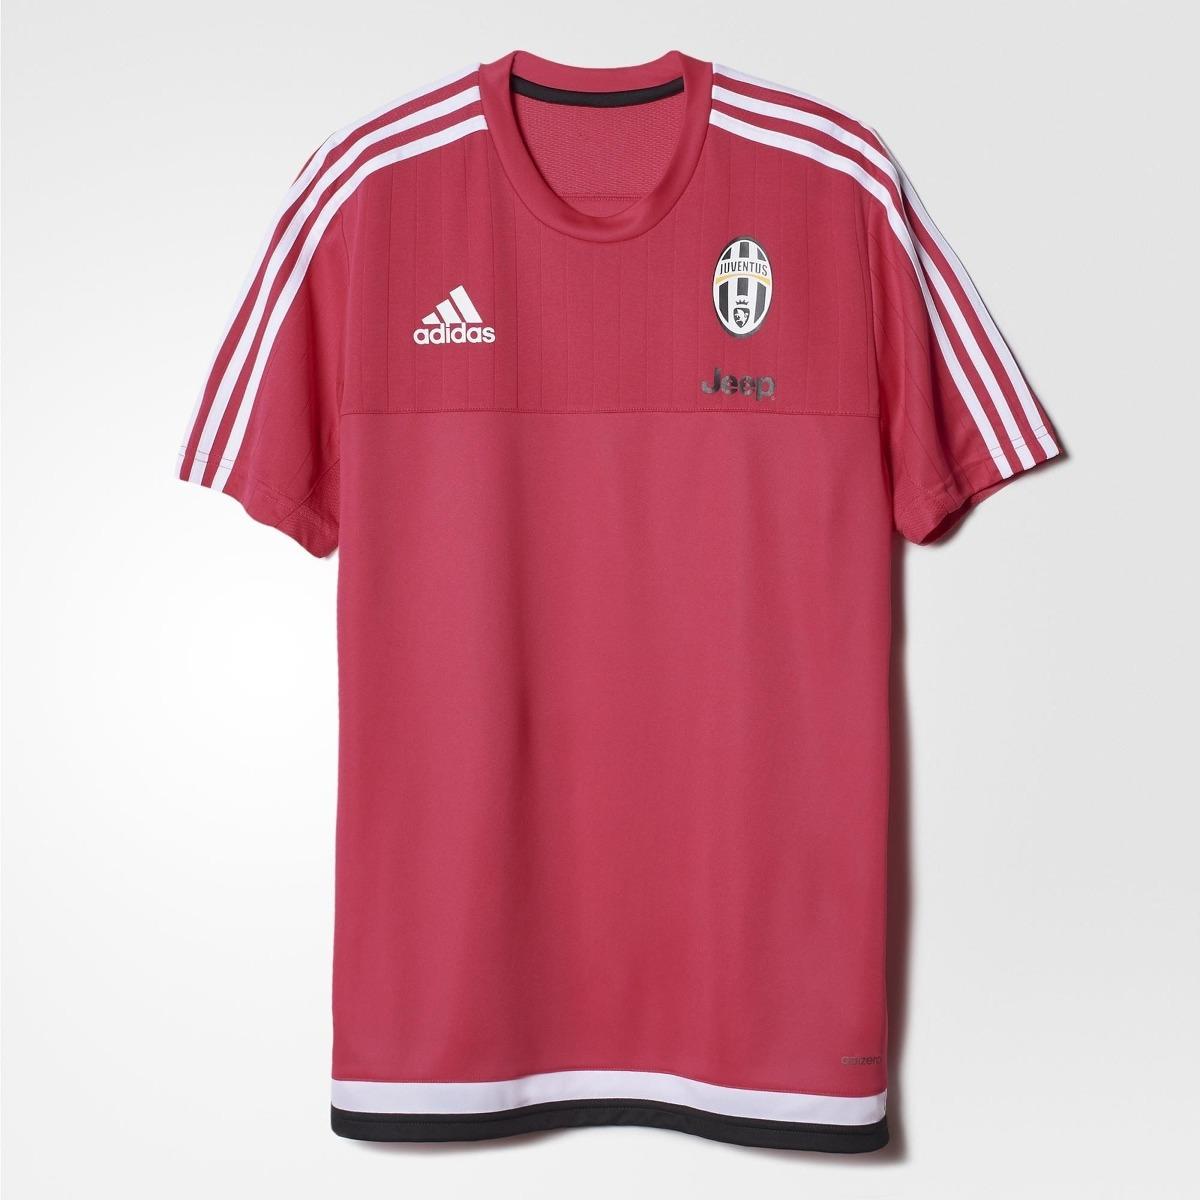 079eccc8ba207 camiseta adidas de treino juventus 2016 rosa original. Carregando zoom.